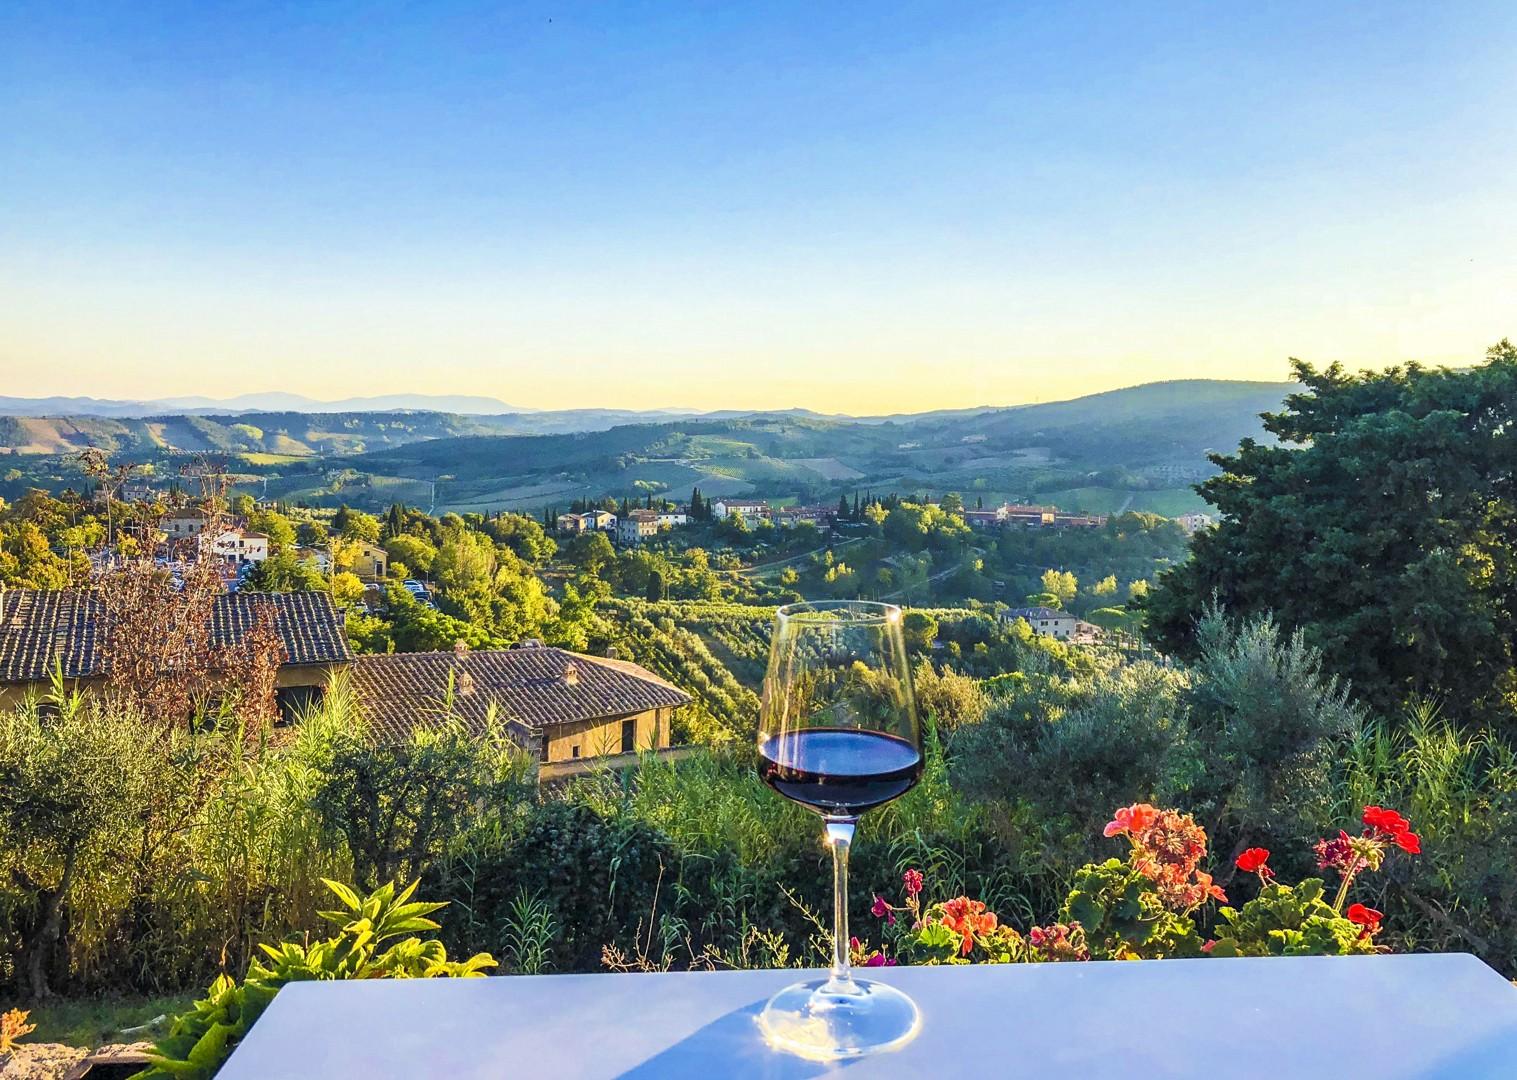 fine-italian-wines-chianti-montepulciano-montalcino-stunning-scenery-cycling-holiday.jpg - Italy - Classic Tuscany - Self-Guided Leisure Cycling Holiday - Italia Leisure and Family Cycling